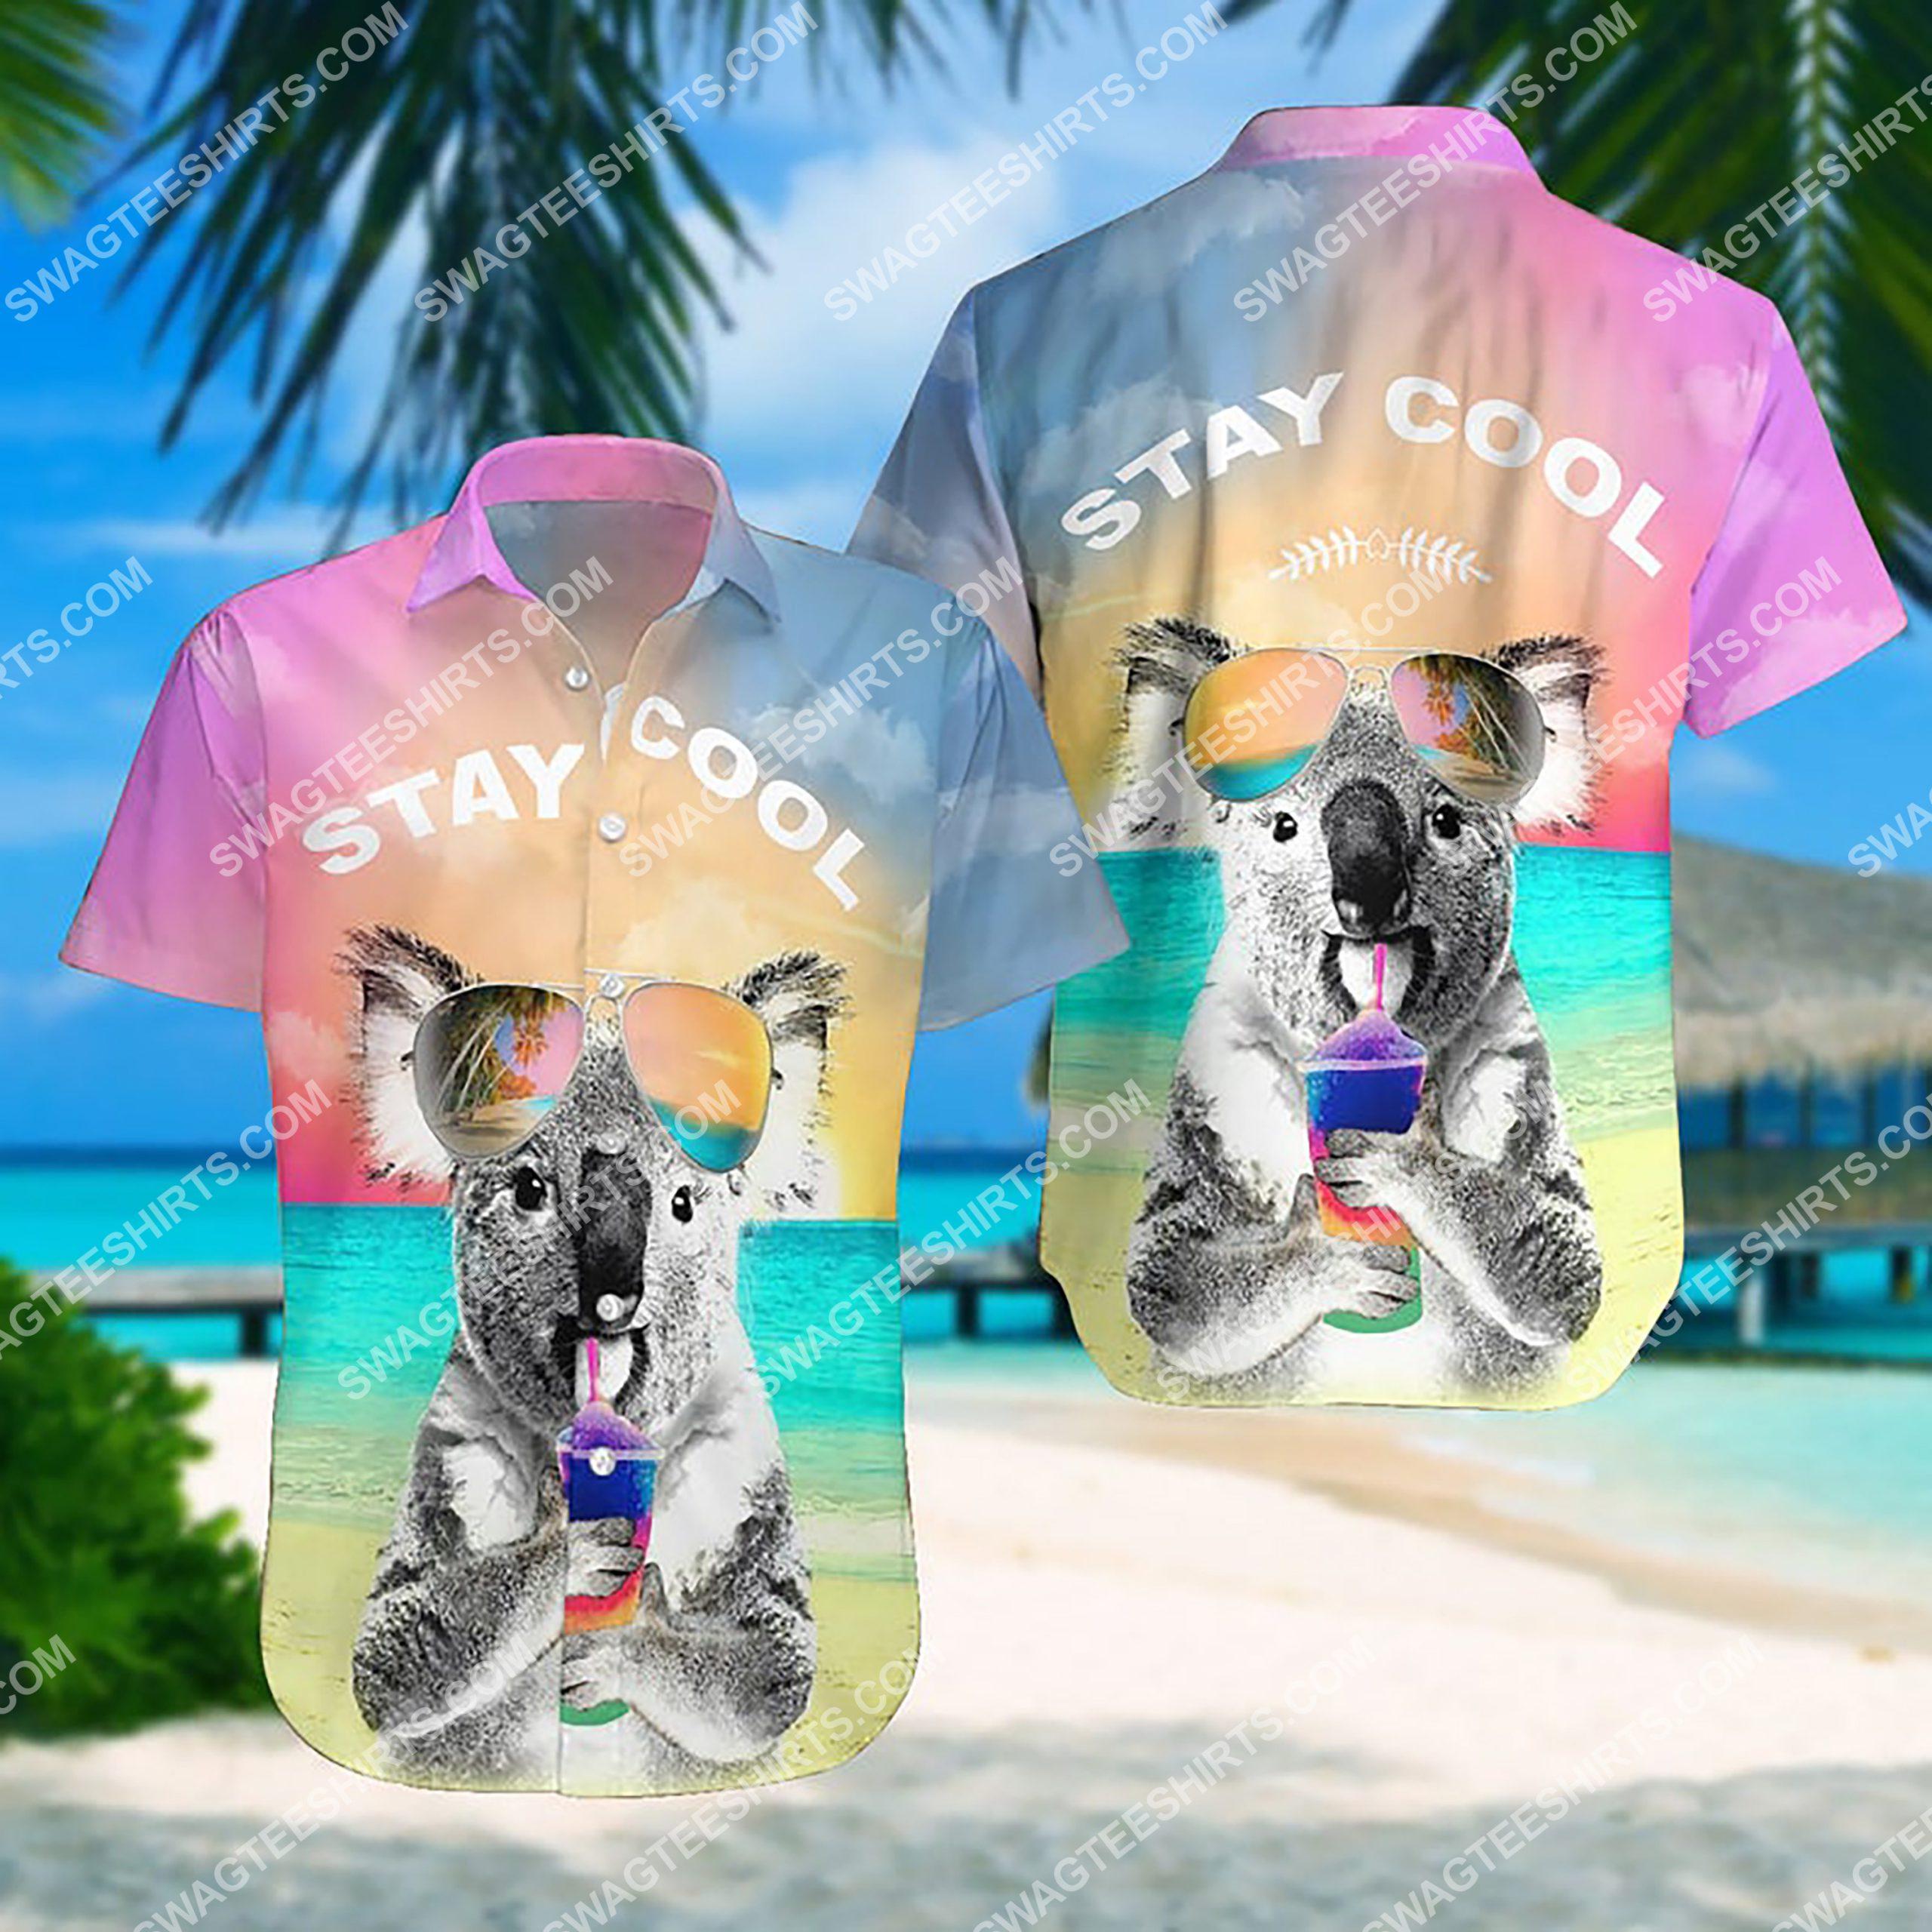 summer time koala stay cool all over print hawaiian shirt 3